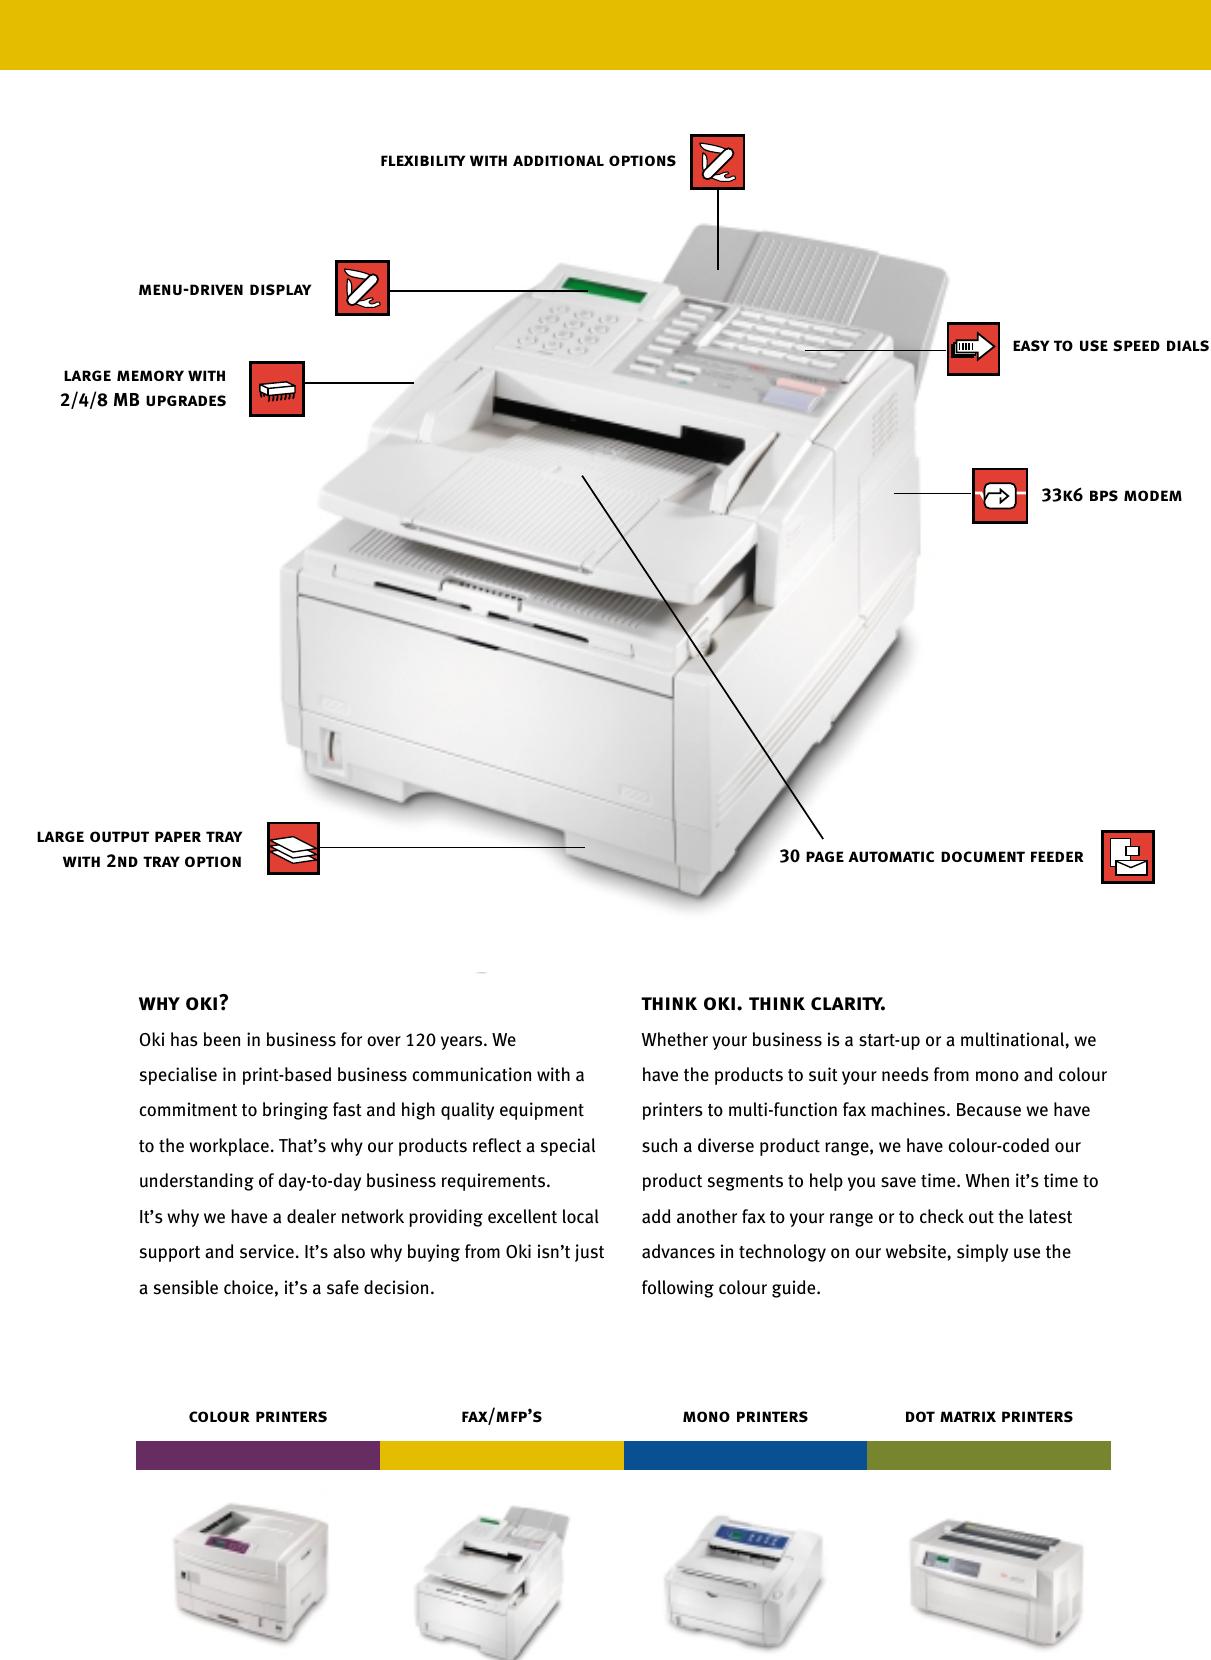 oki c610 manual basic instruction manual u2022 rh winwithwomen2012 com Oki C610 Laser Printer Oki C610 Laser Printer